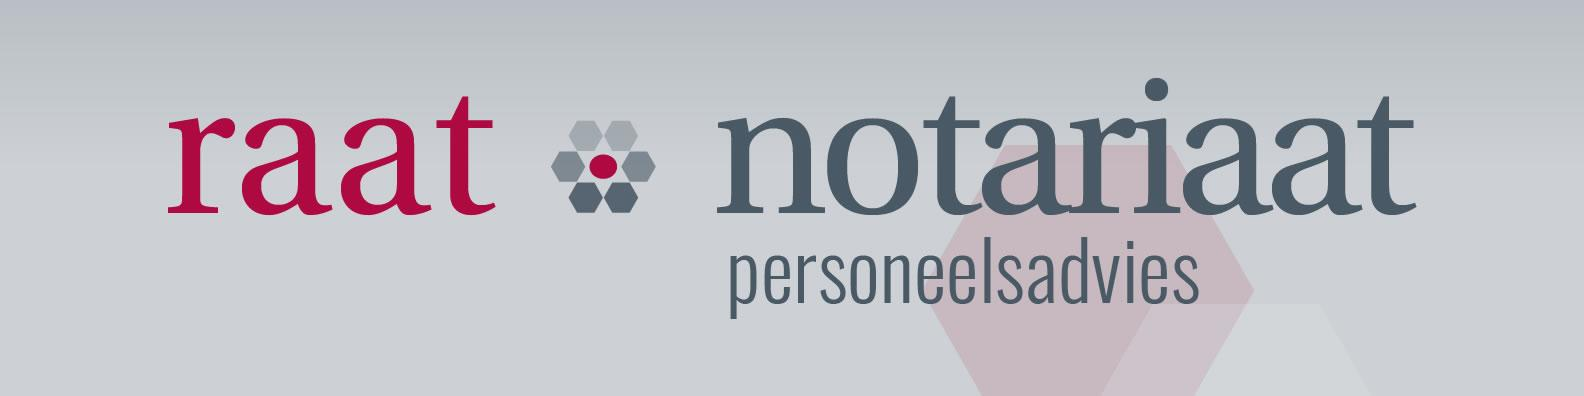 Kandidaat- notaris OR (junior + medior)